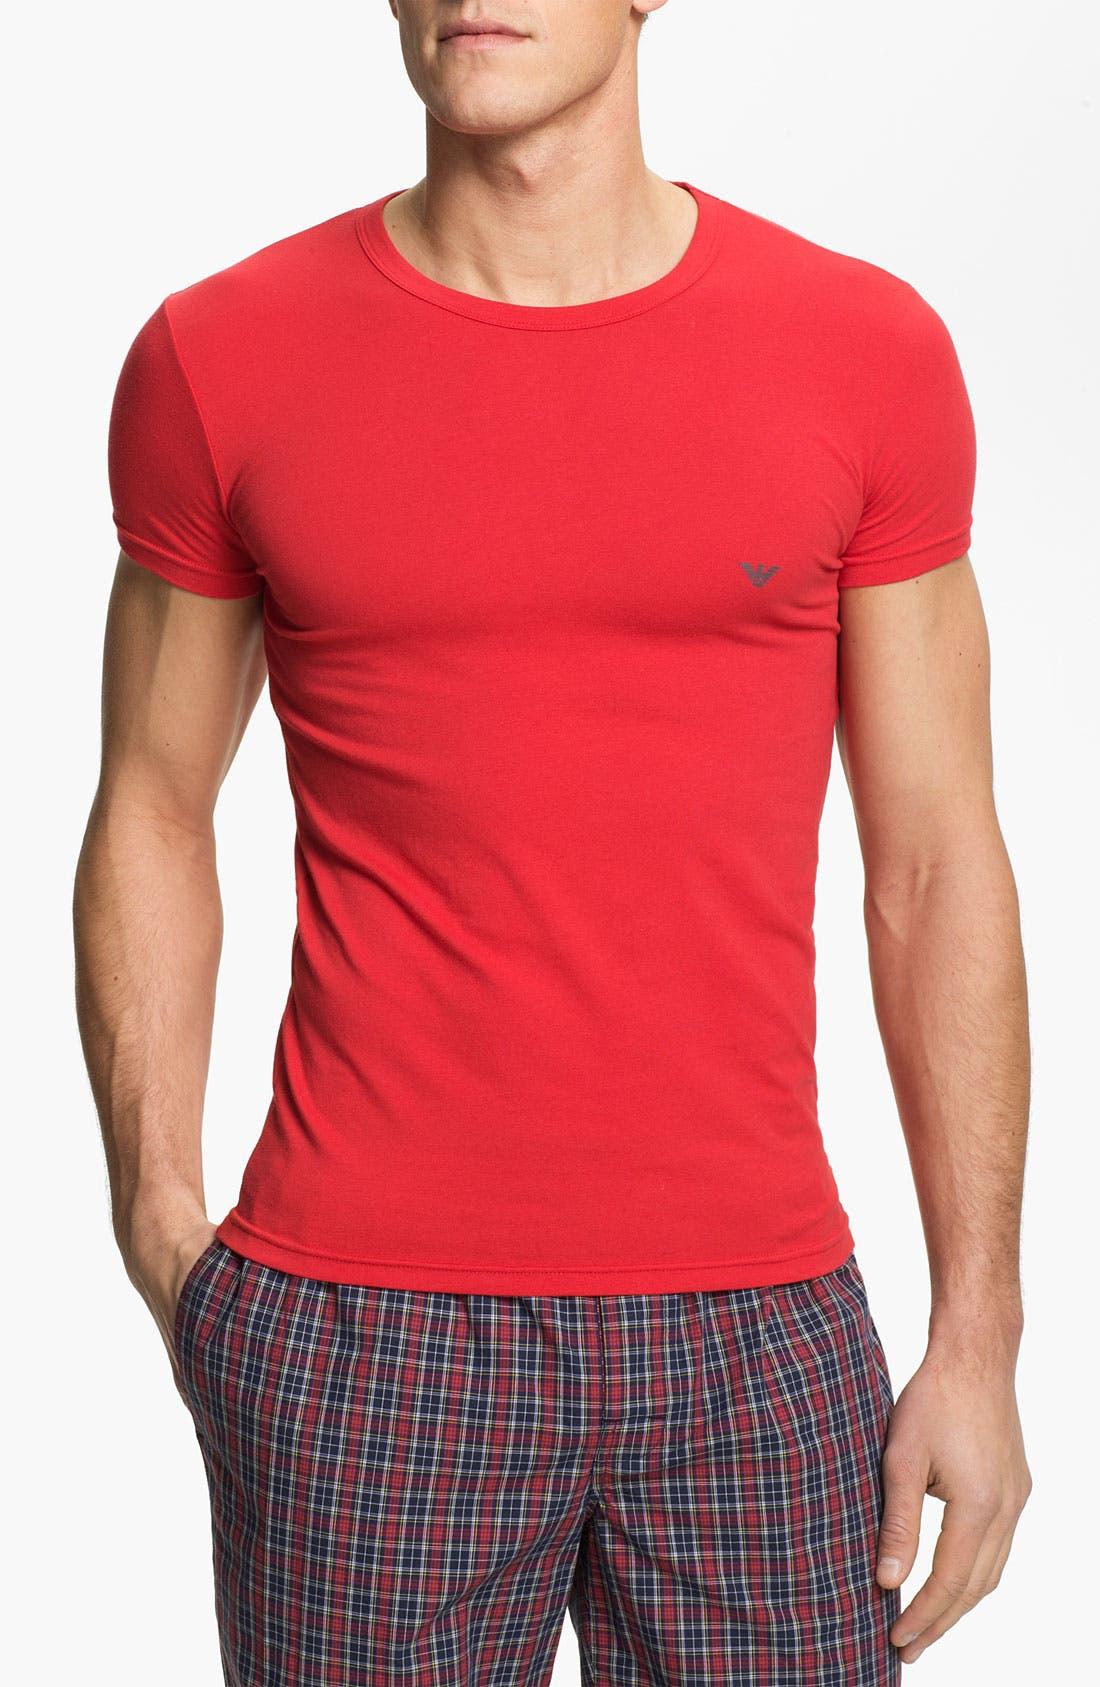 Main Image - Emporio Armani 'Eagle' Stretch Cotton Crewneck T-Shirt